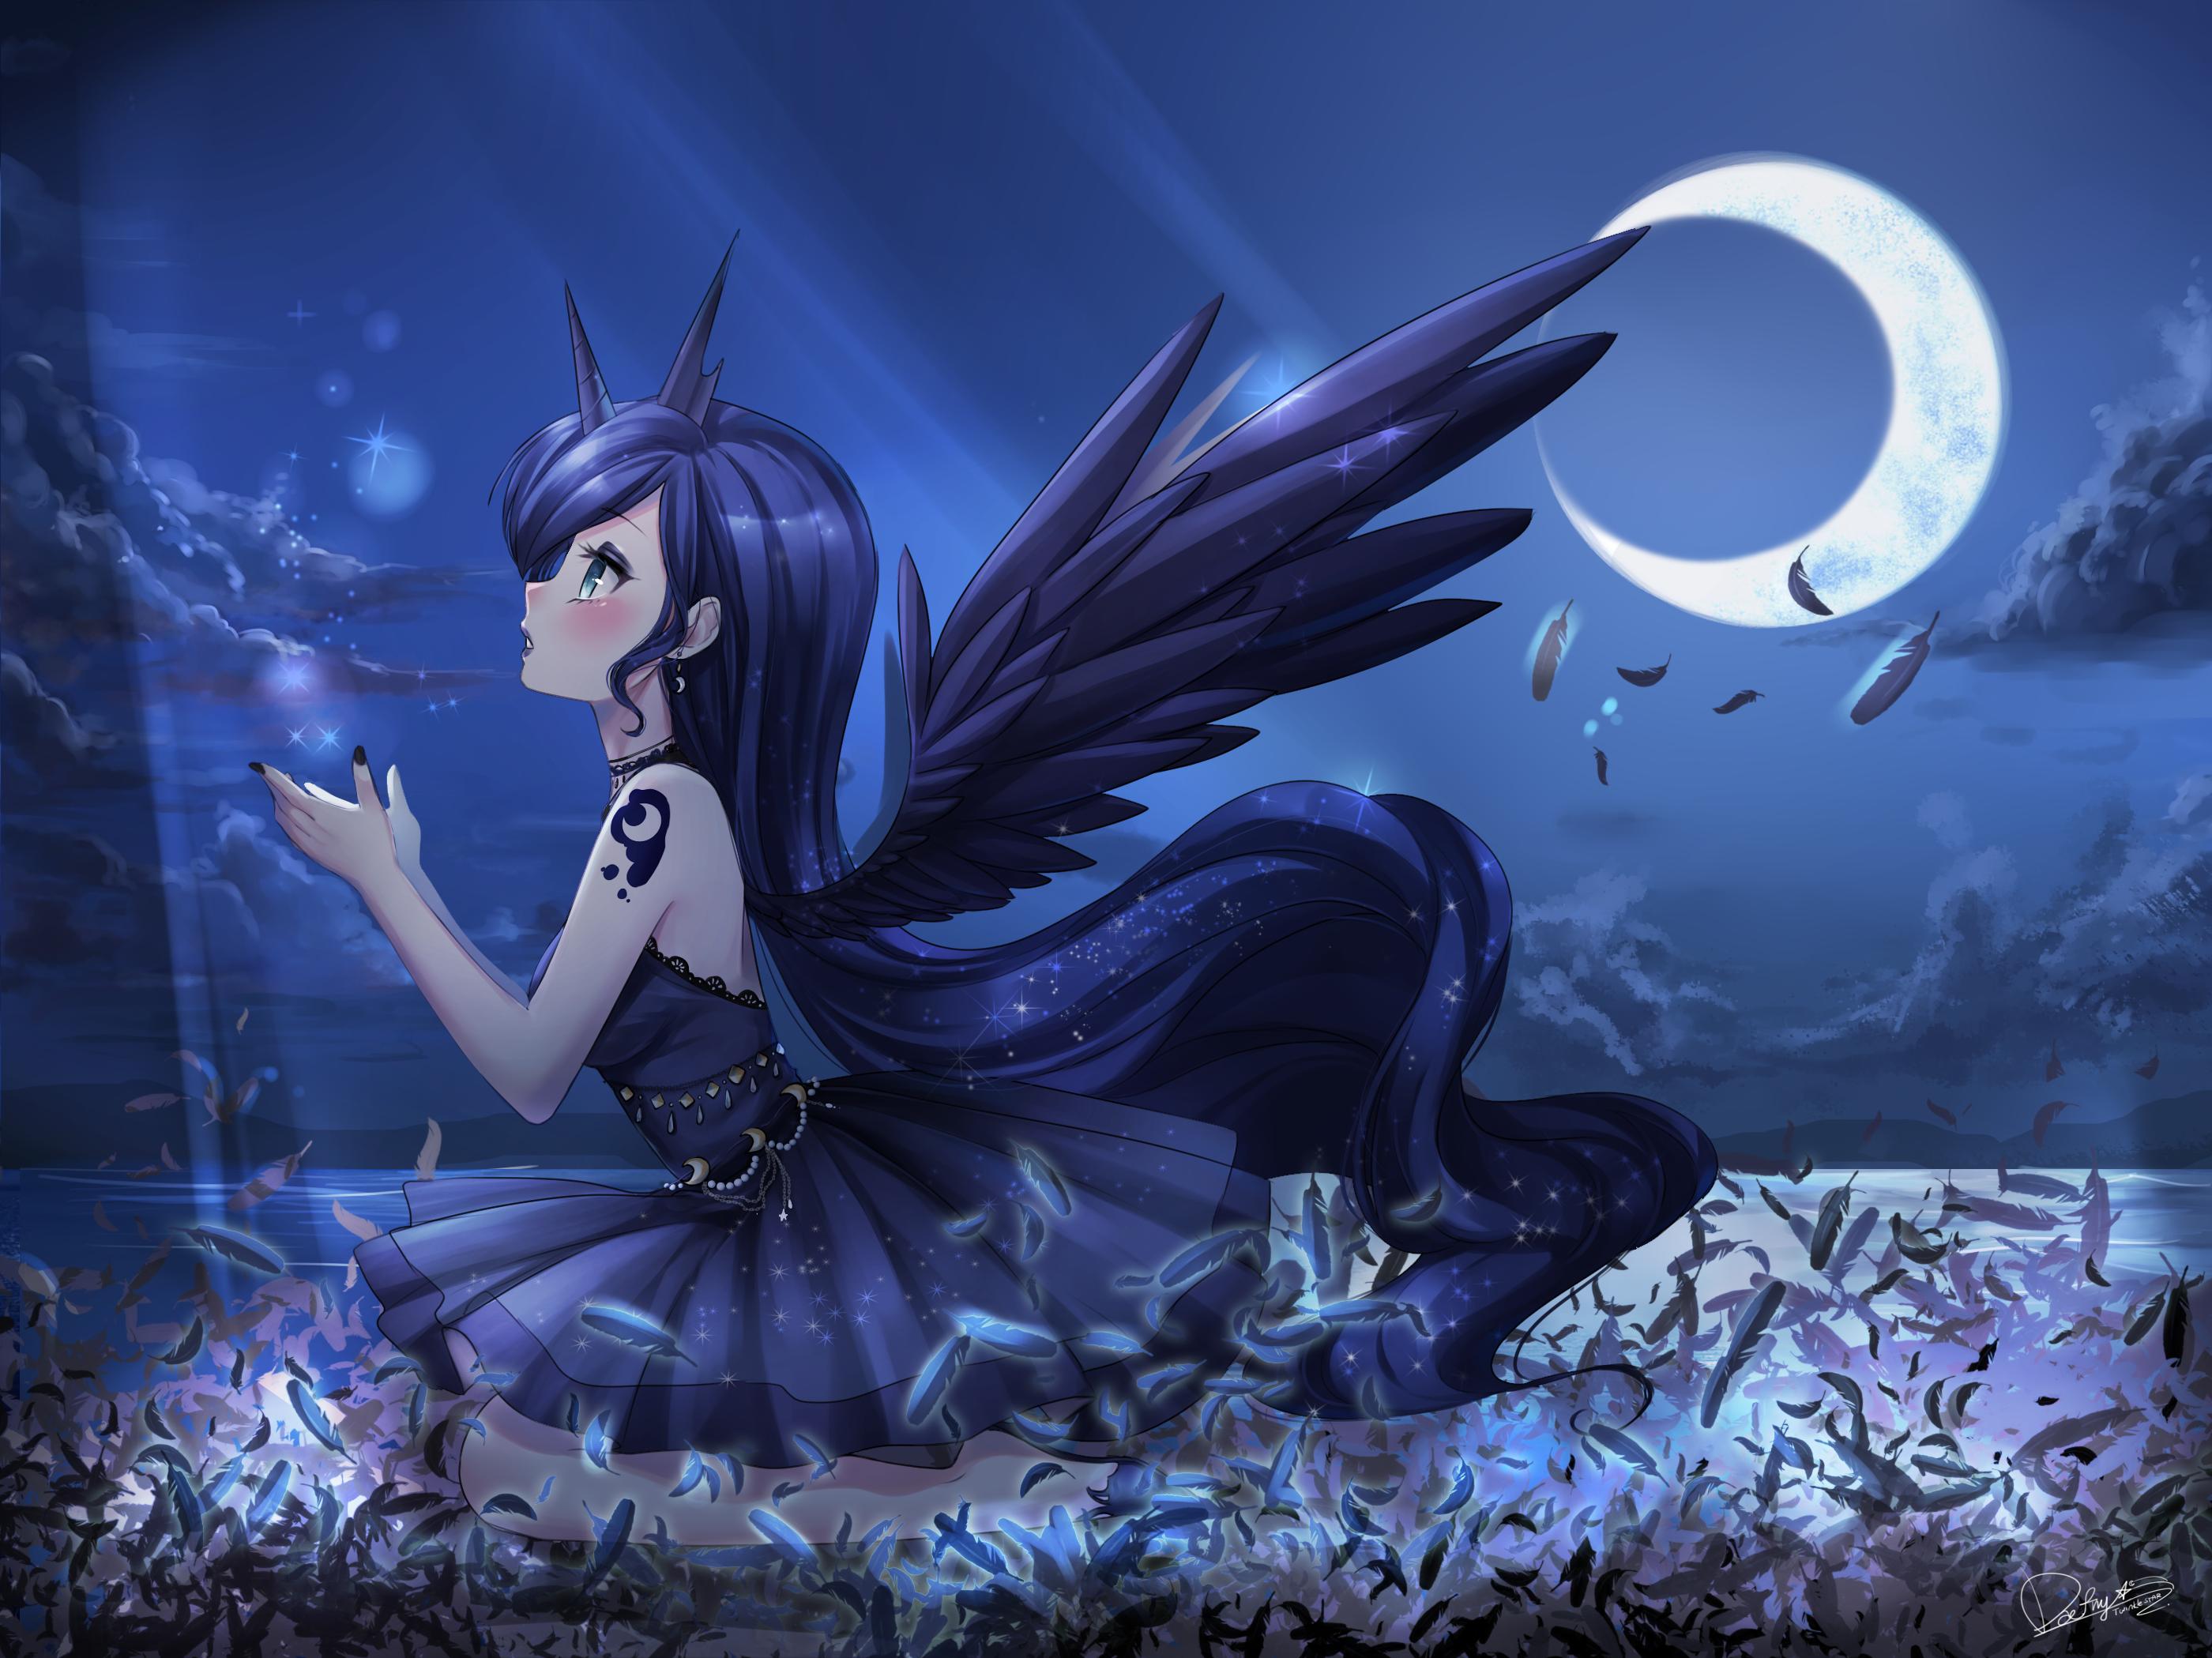 princess_luna_by_odaefnyo-db8qv7u.png